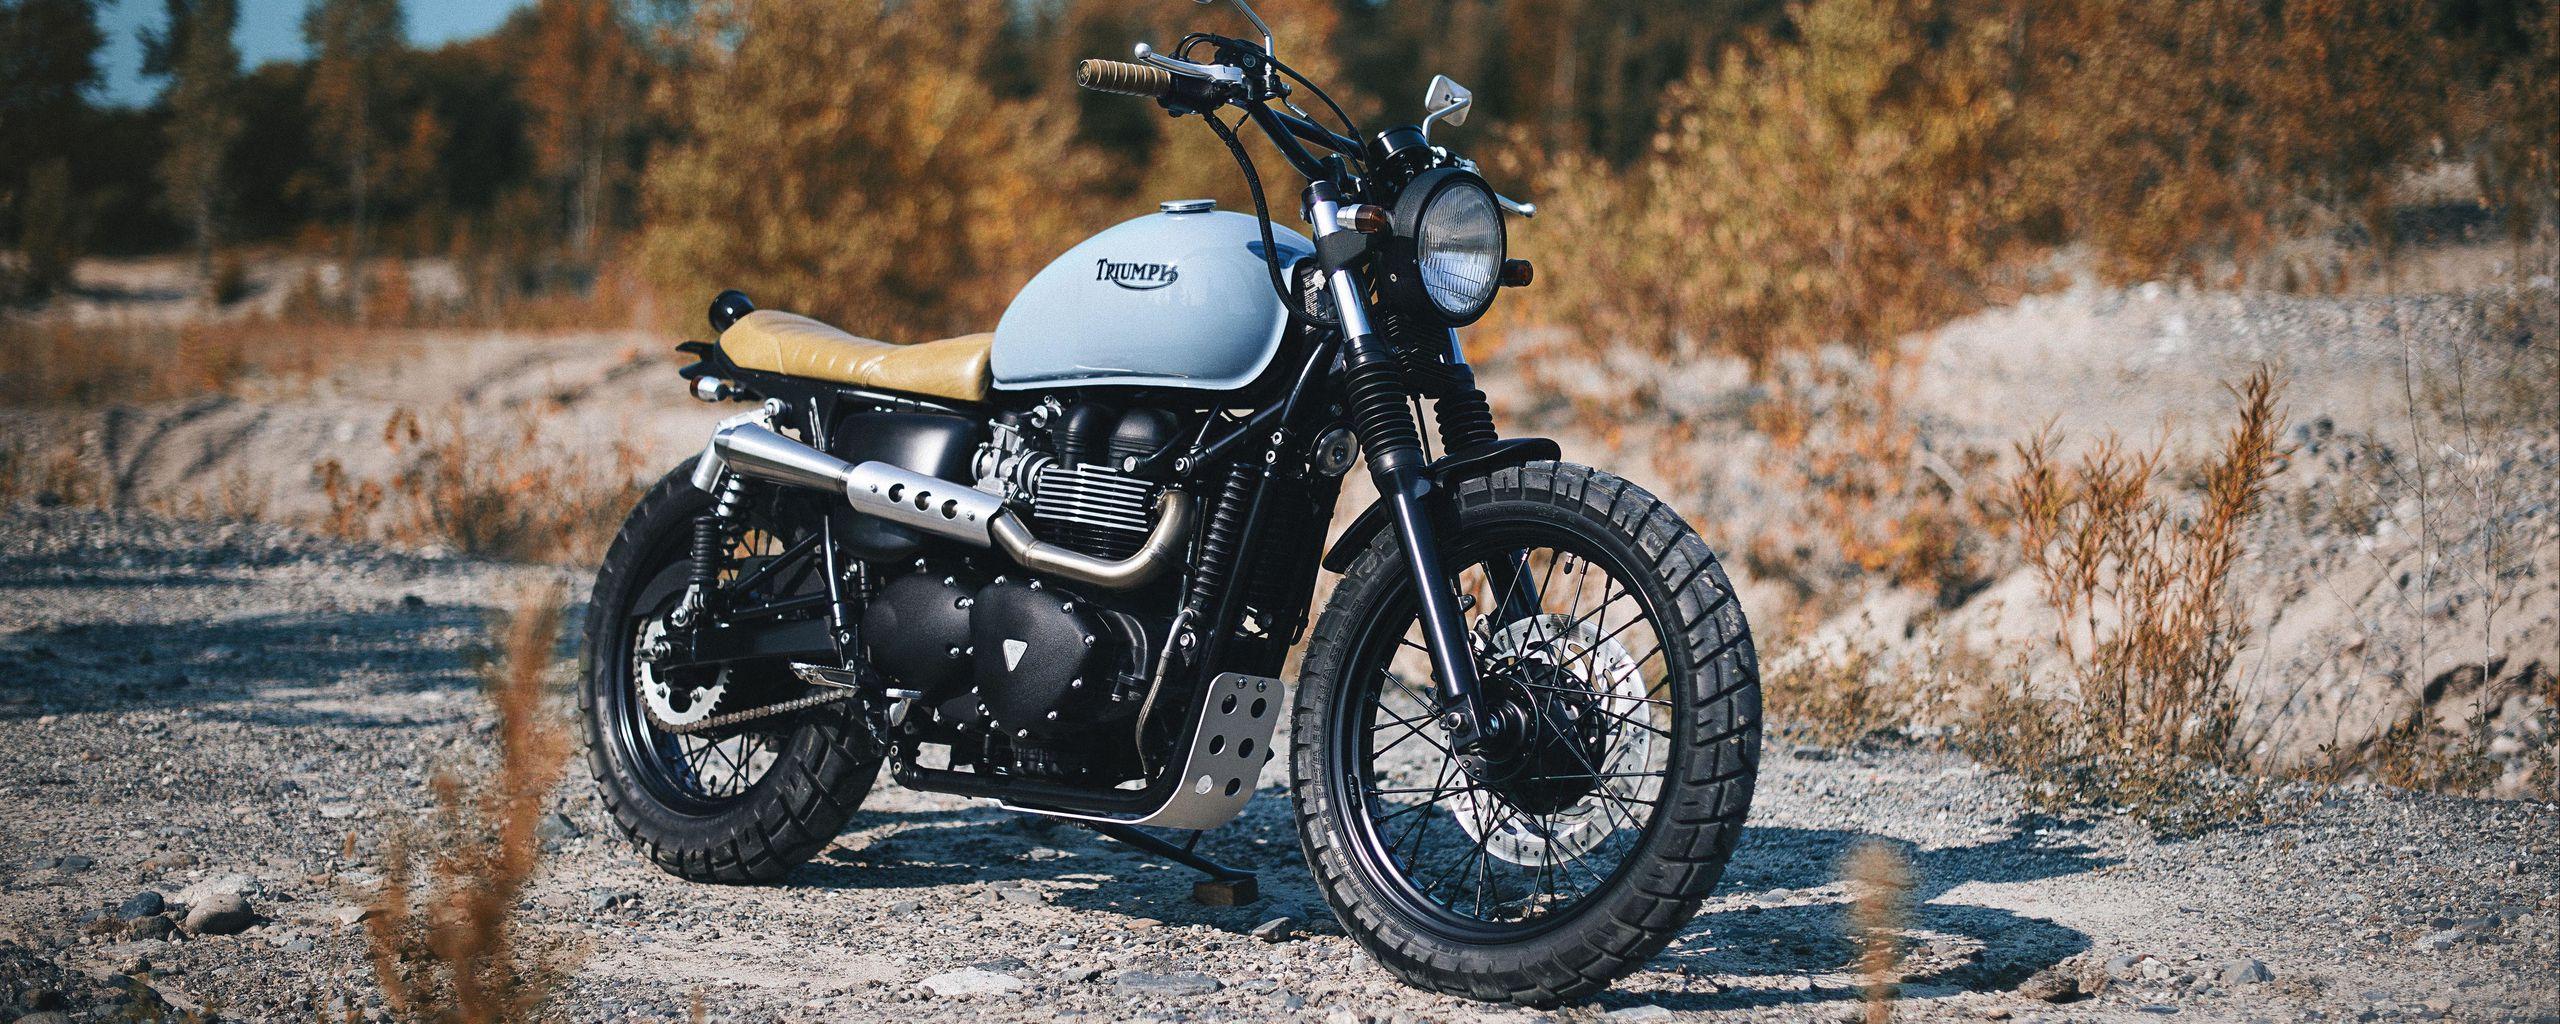 2560x1024 Обои triumph, bonneville, мотоцикл, вид сбоку